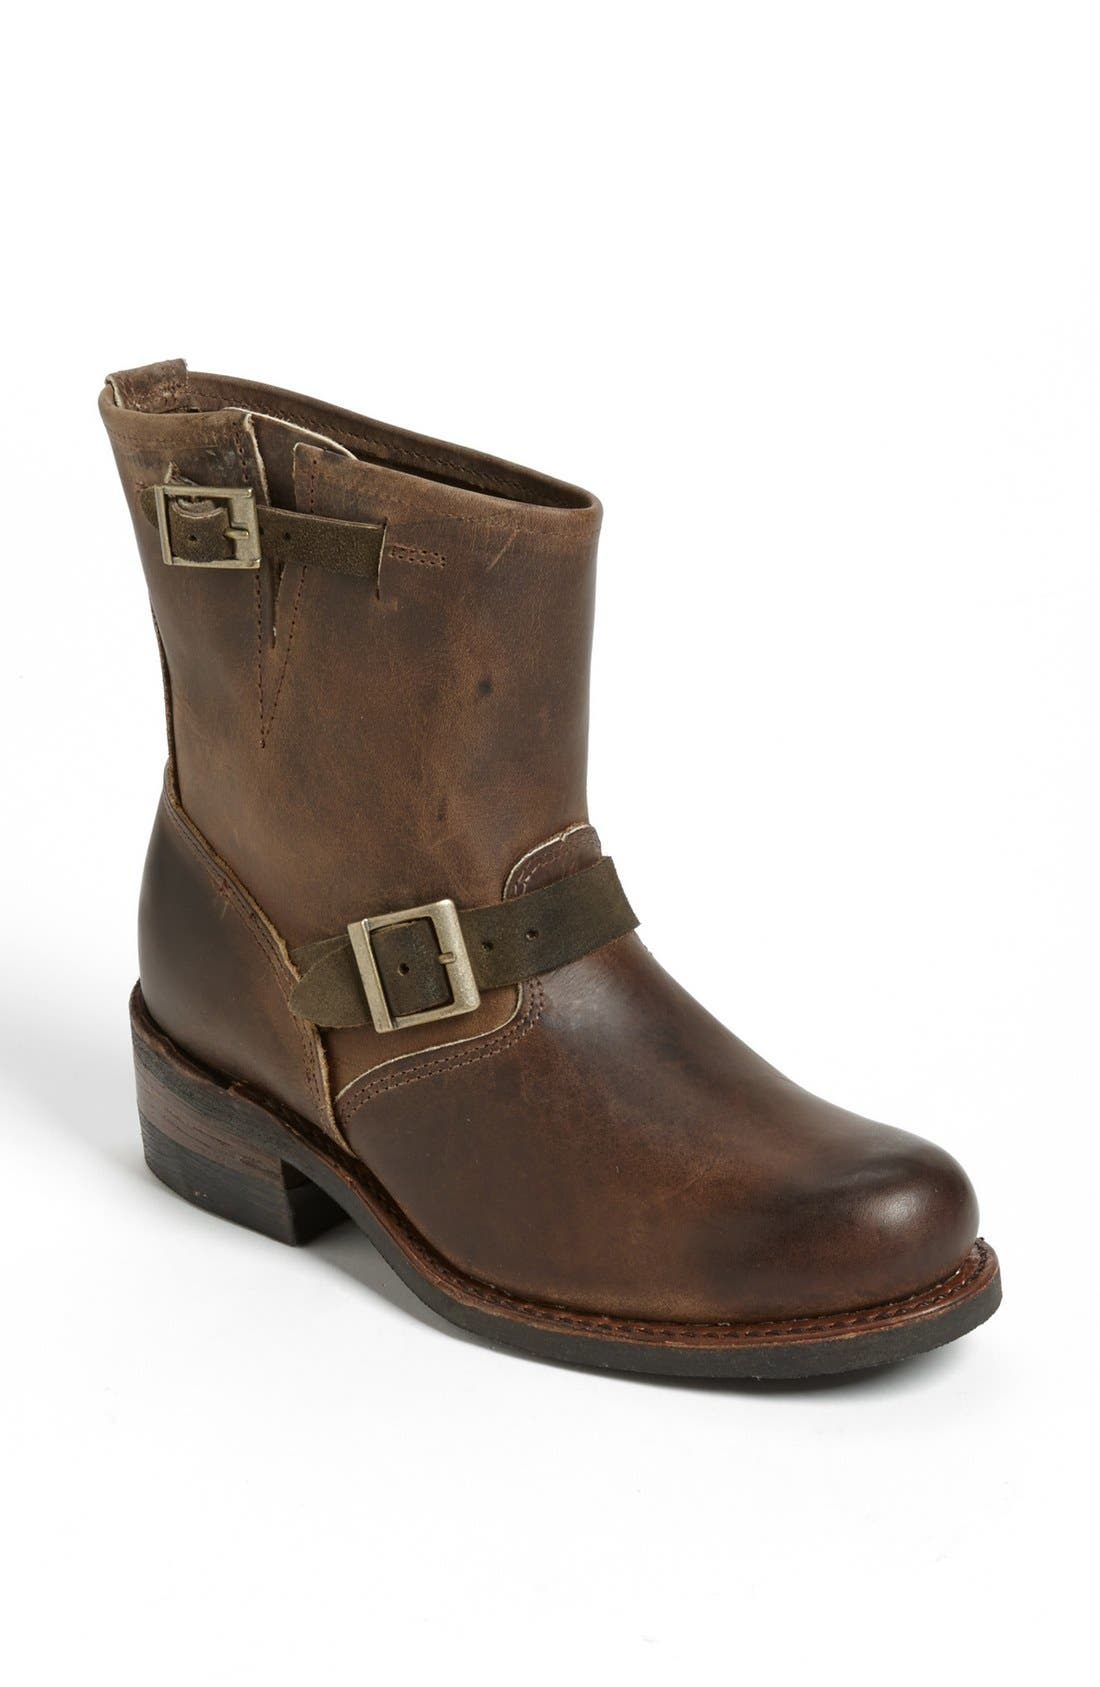 Alternate Image 1 Selected - Vintage Shoe Company 'Sophie' Boot